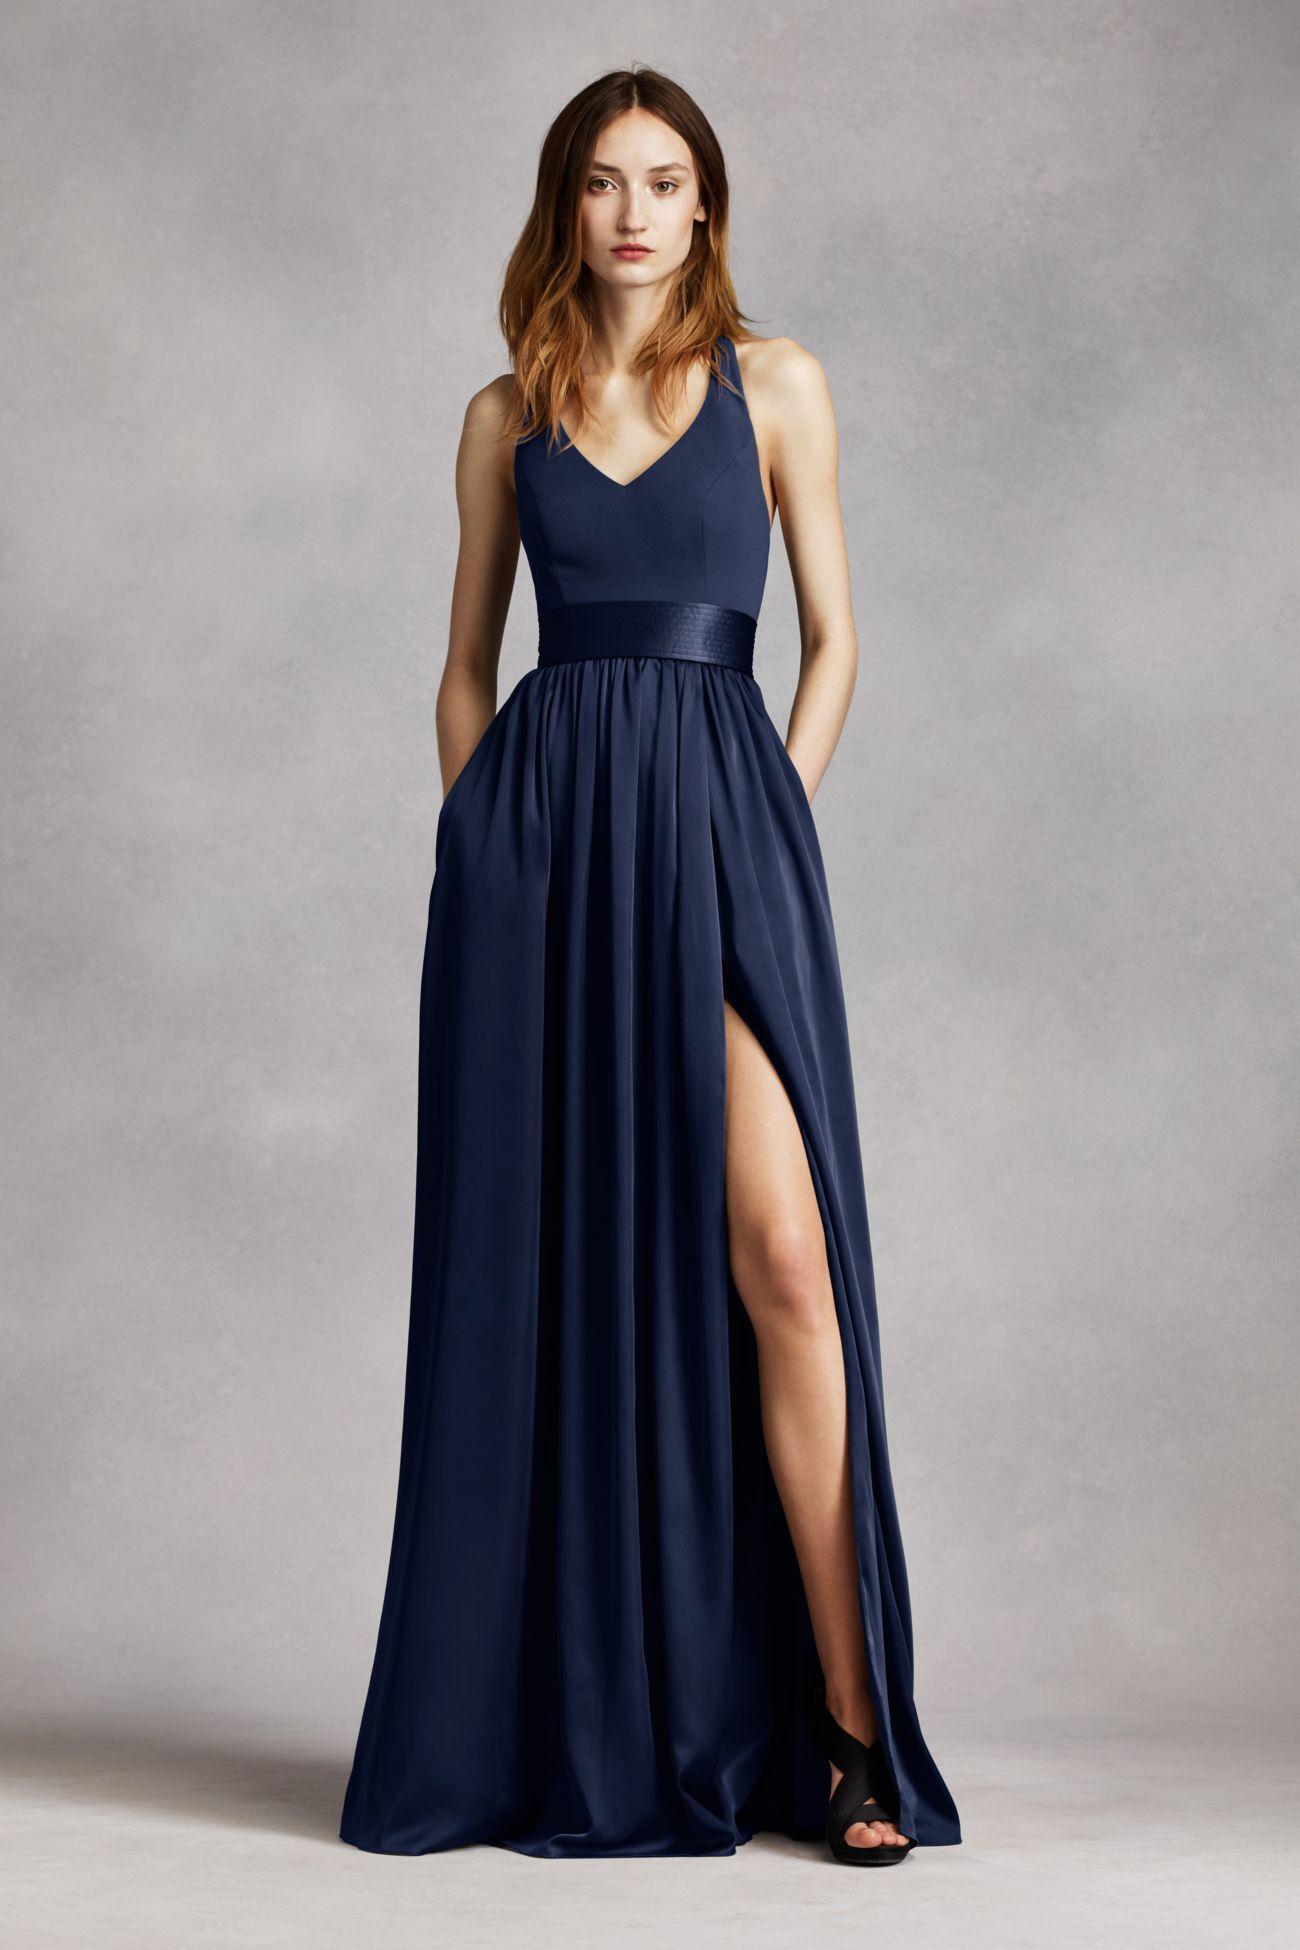 My New Favorite! www.davidsbridal.com/10277801 | Bridesmaids | Pinterest